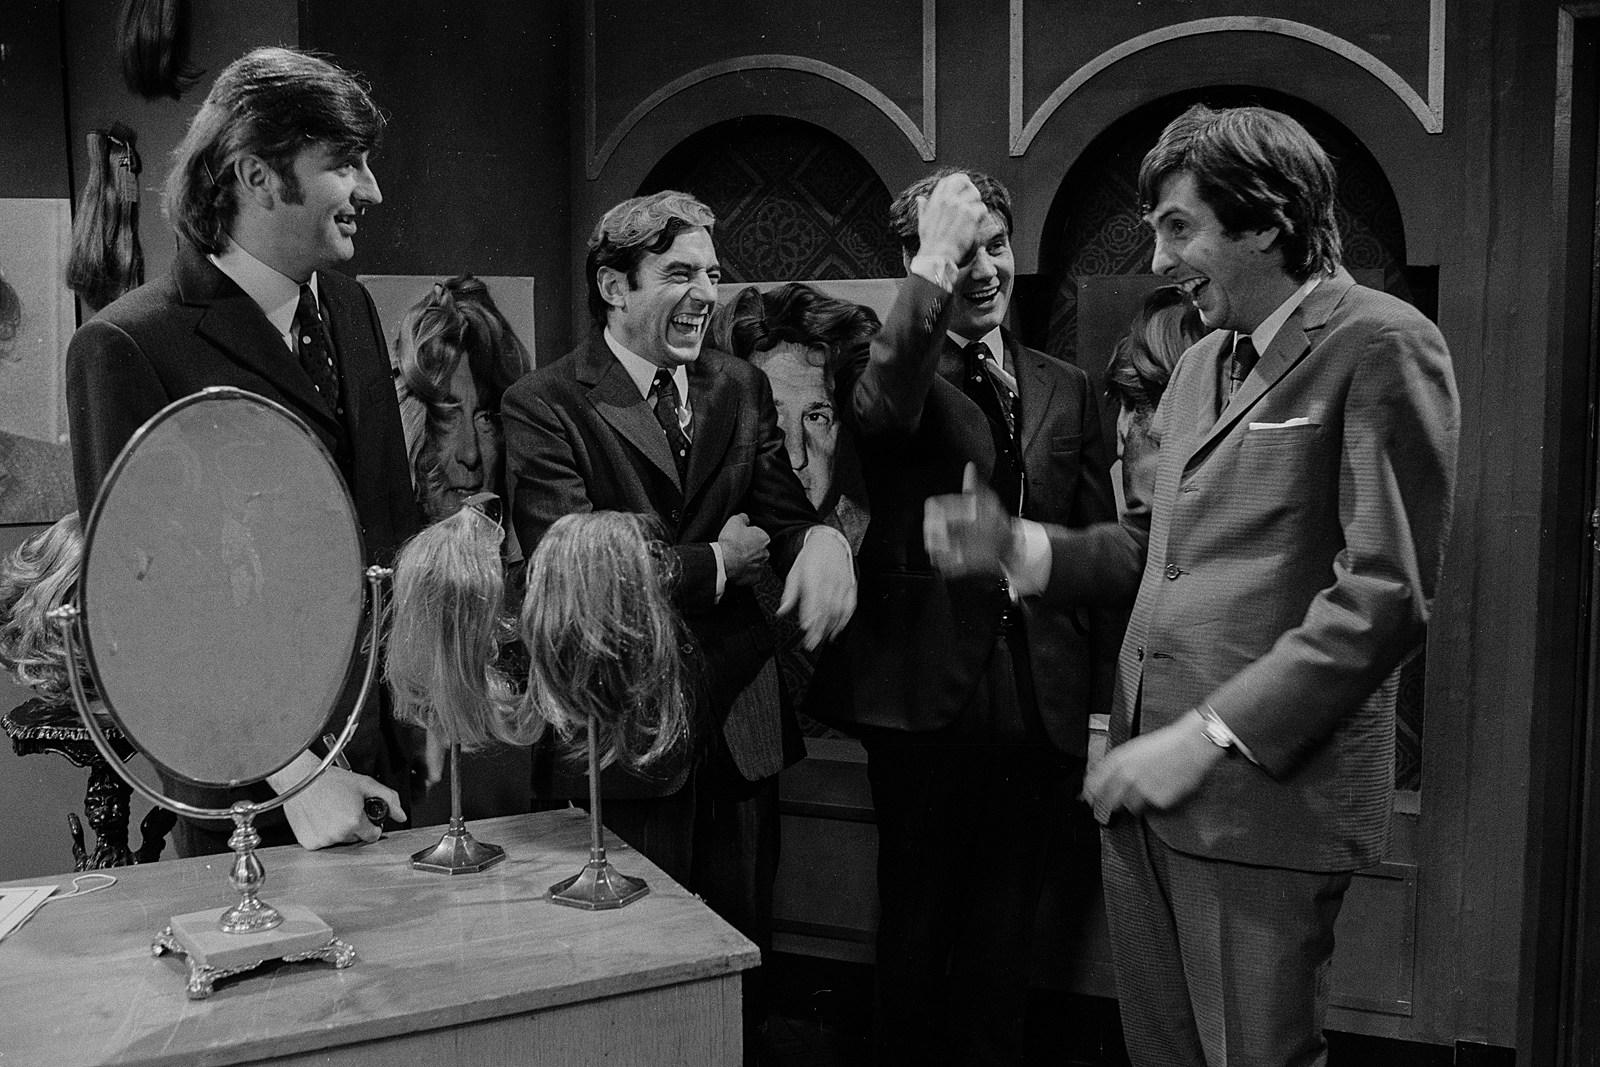 45 Years Ago: 'Monty Python's Flying Circus' Says Goodbye